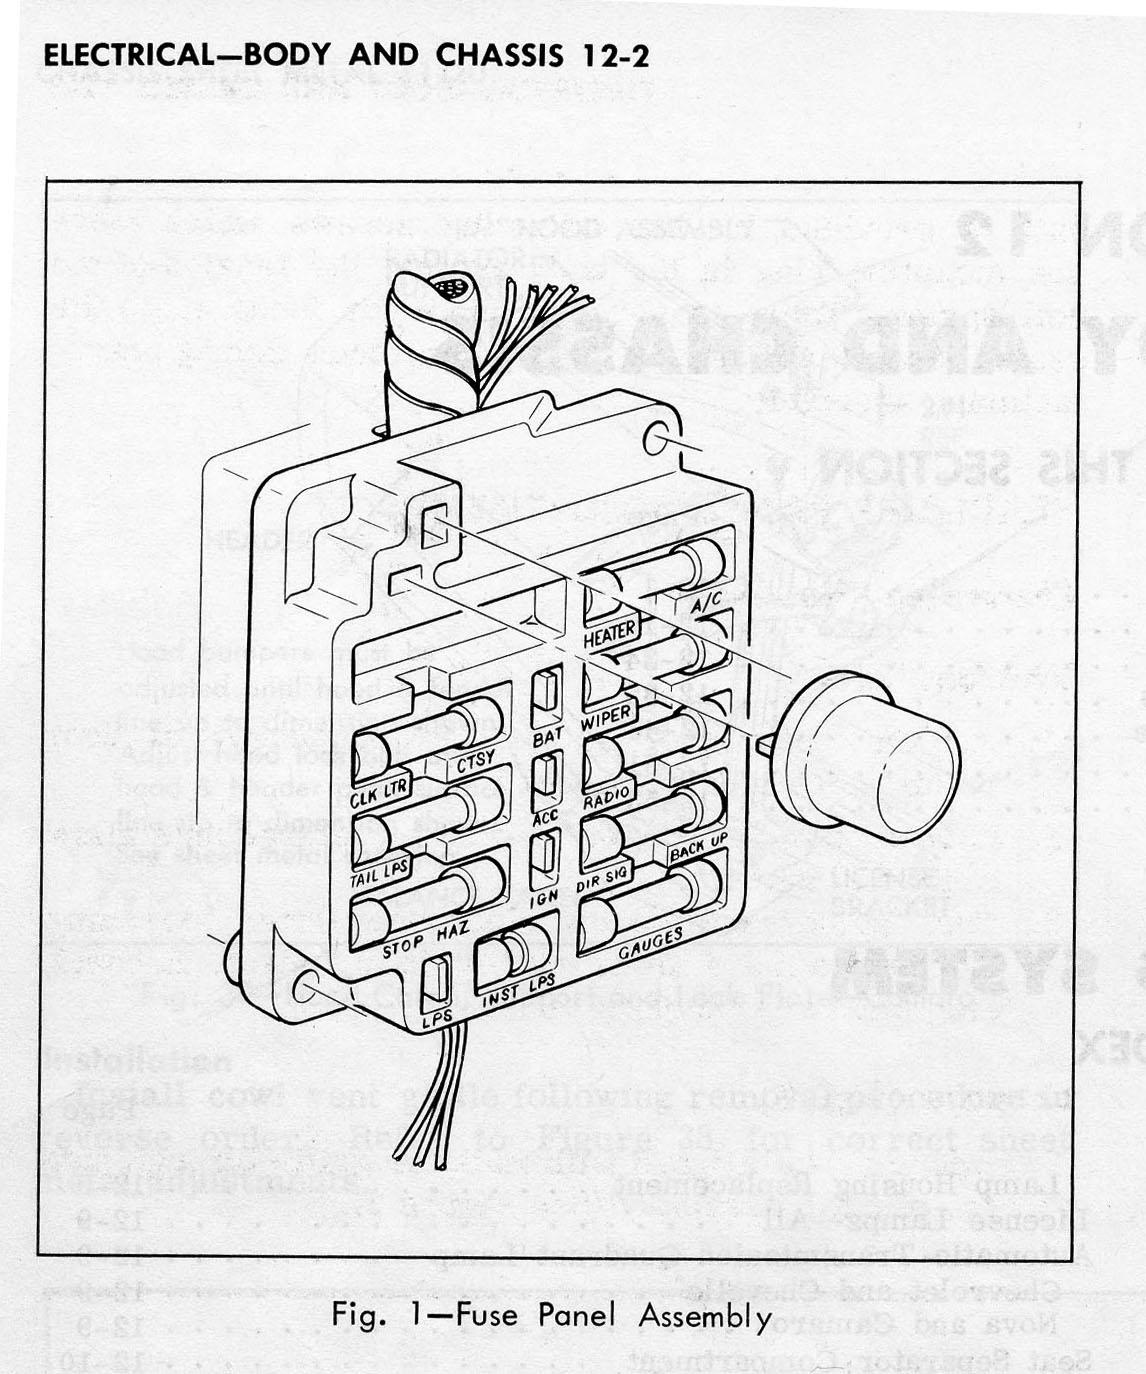 fuse box diagram for 1998 lincoln continental